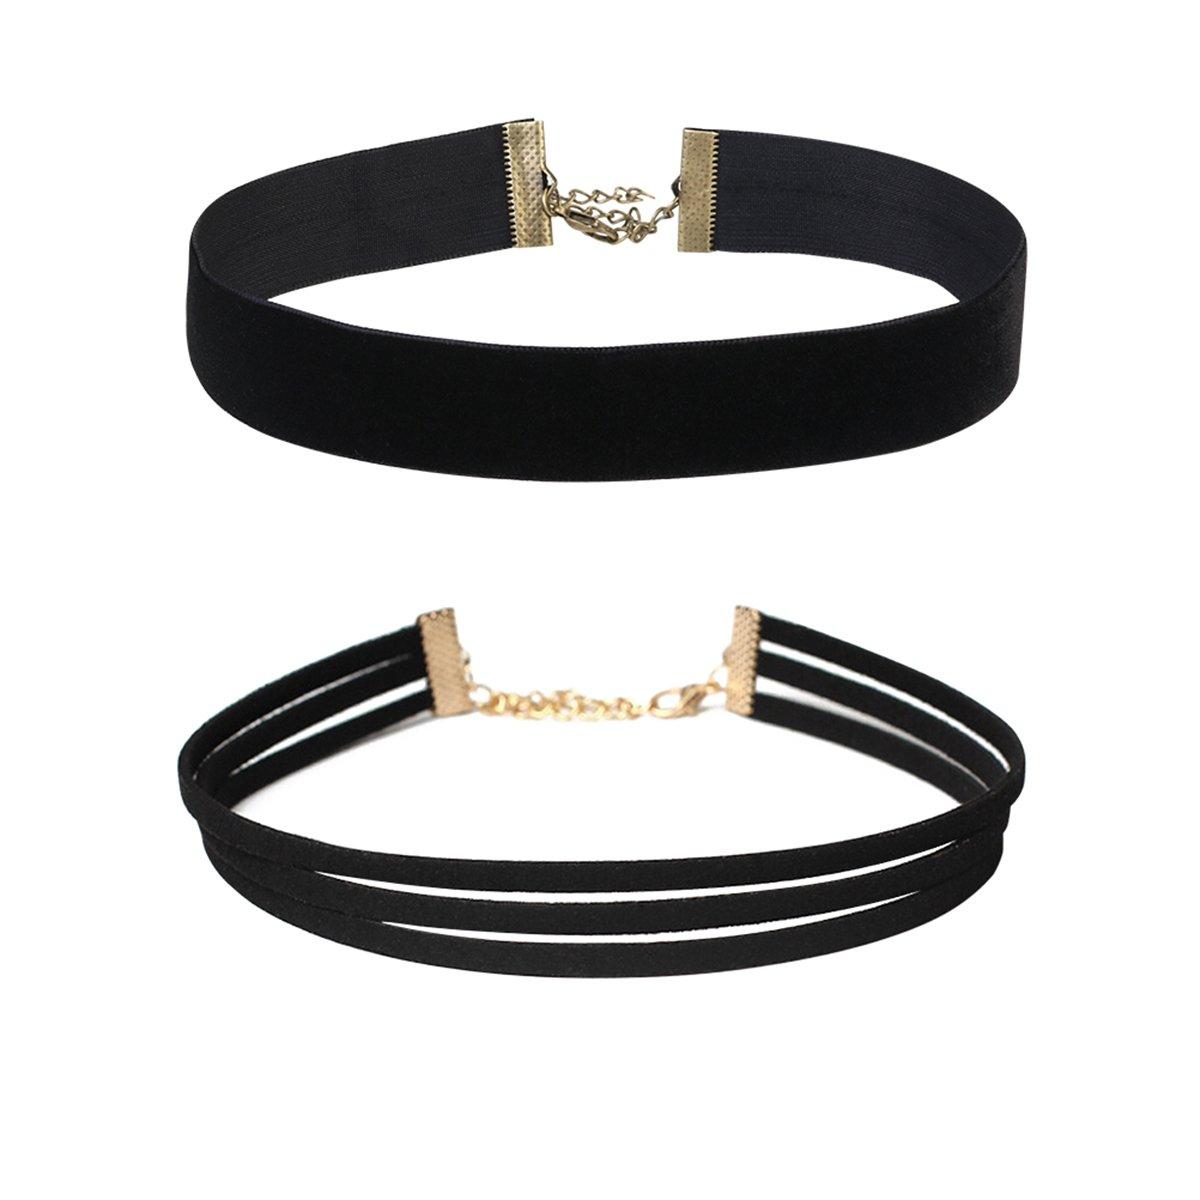 OULII 12/Unidades Chocker Collar Cadenas chockers Cuello Bandas Collar Tattoo Collar Collar